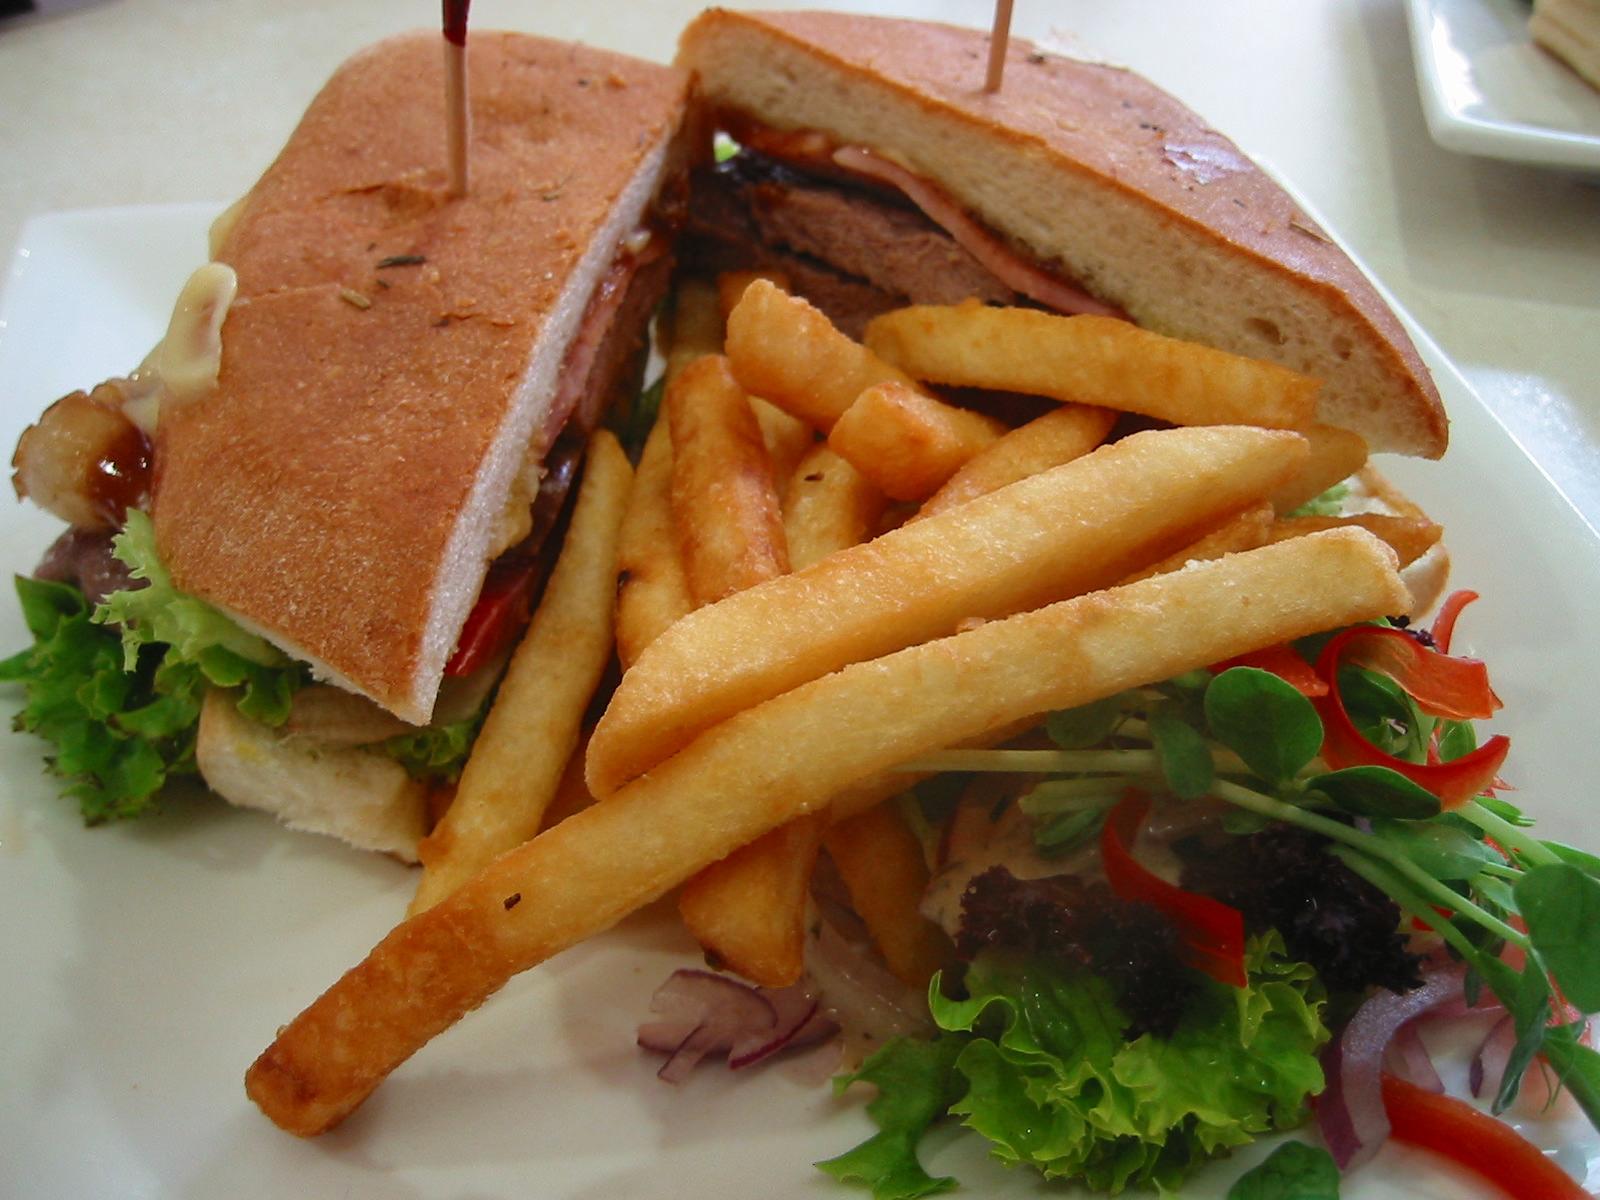 Steak sandwich and chips